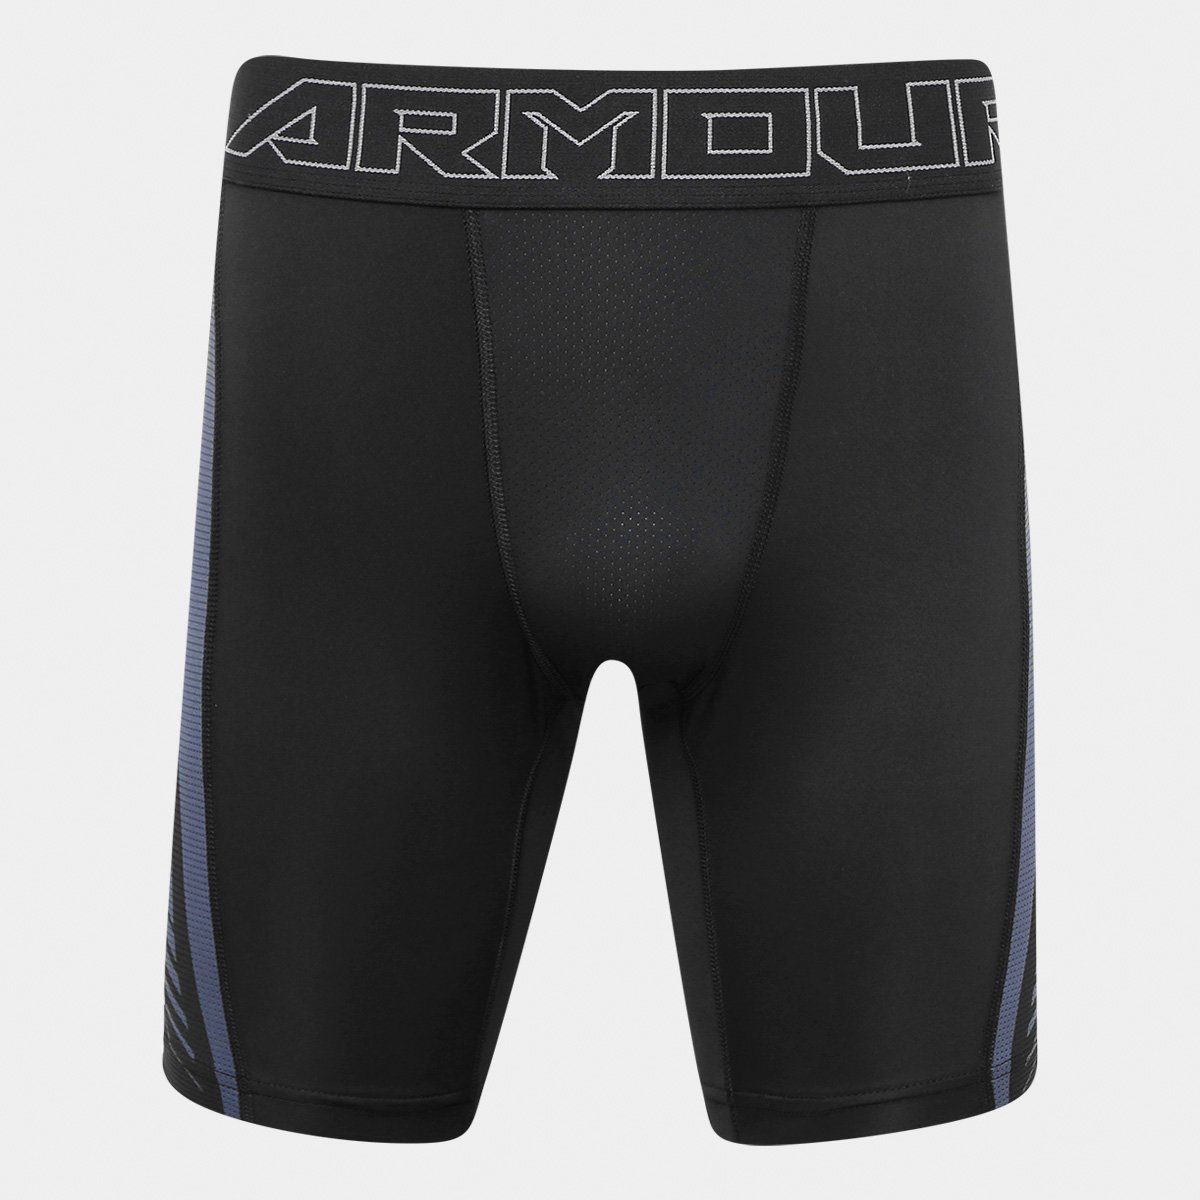 71a7725f8d851 Short de Compressão Under Armour HeatGear Supervent 2.0 Masculino - Compre  Agora